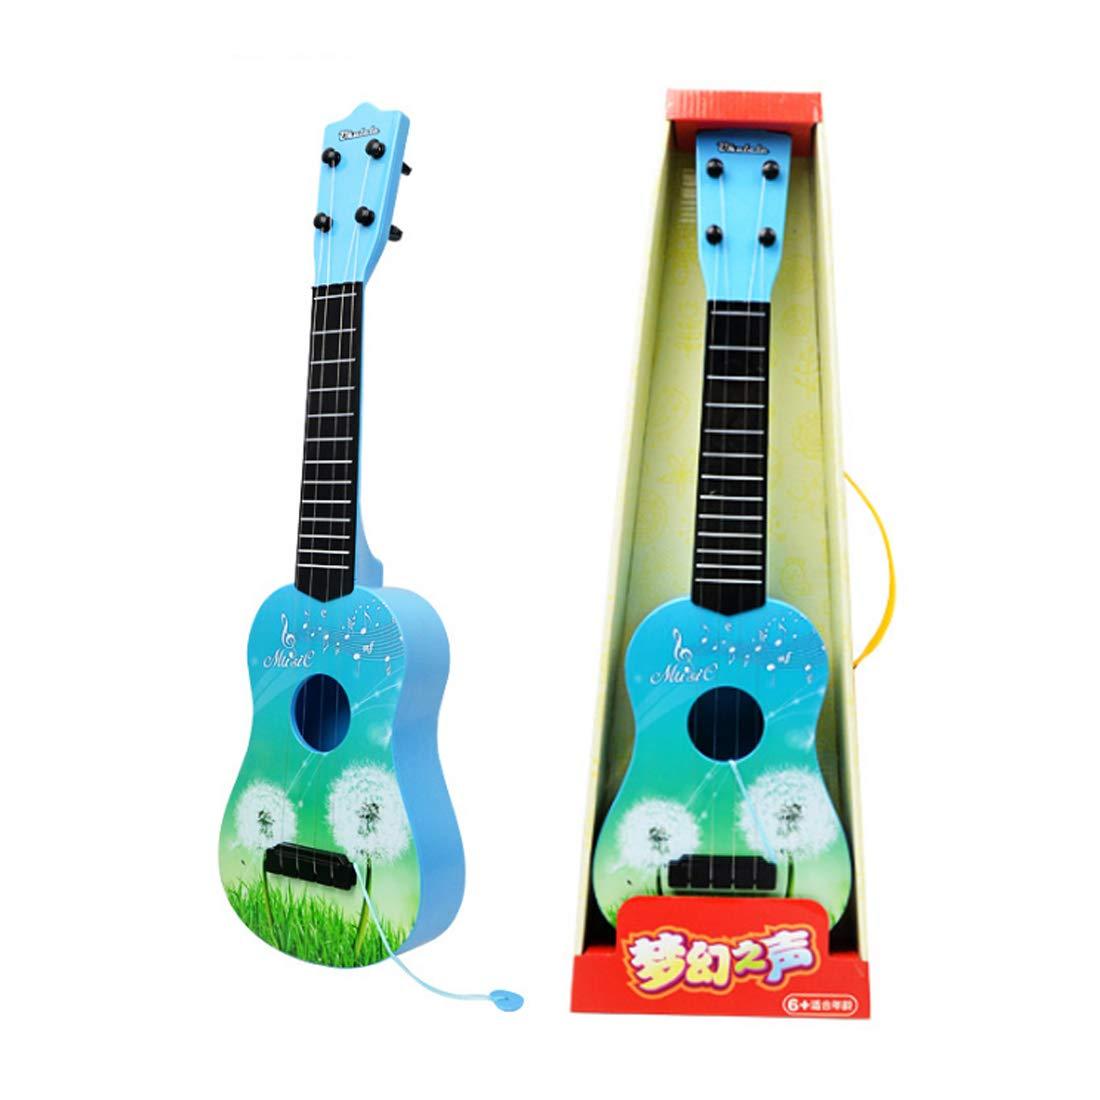 DAN DISCOUNTS Ukulele Kindergitarre, Simulation Ukulele Spielzeug 4 Saiten Kindergitarre Kinder Gitarre Pädagogisches Spielzeug für ab 3 Jahre- Blau L